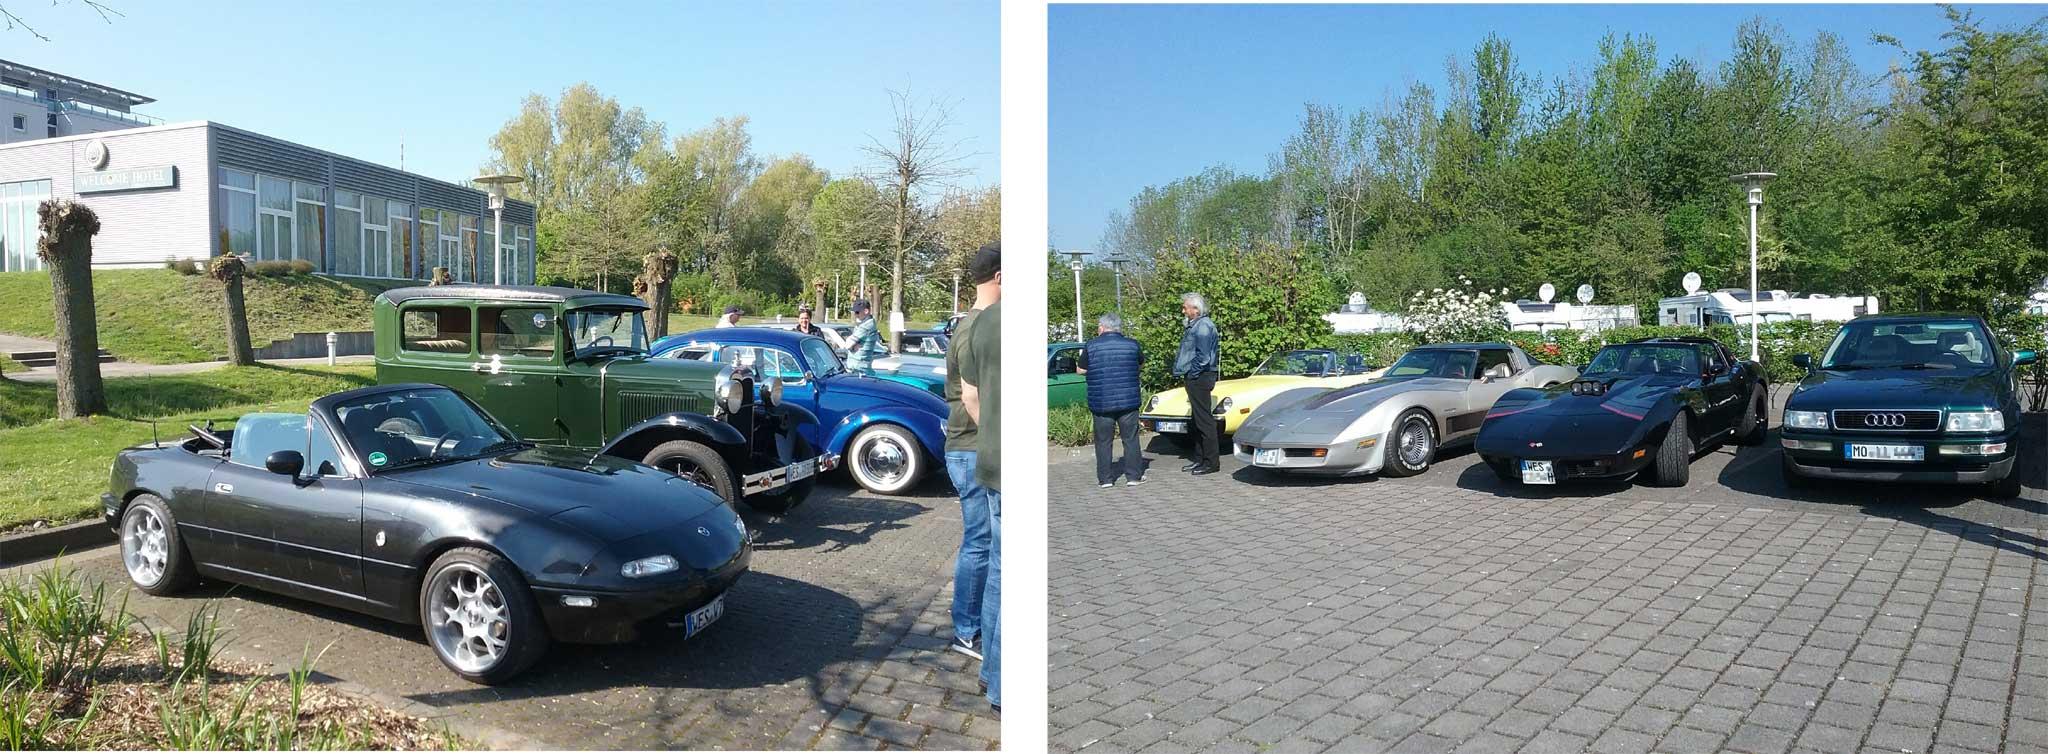 Youngtimer Events, Mehrere Corvette Stingray und der MX5